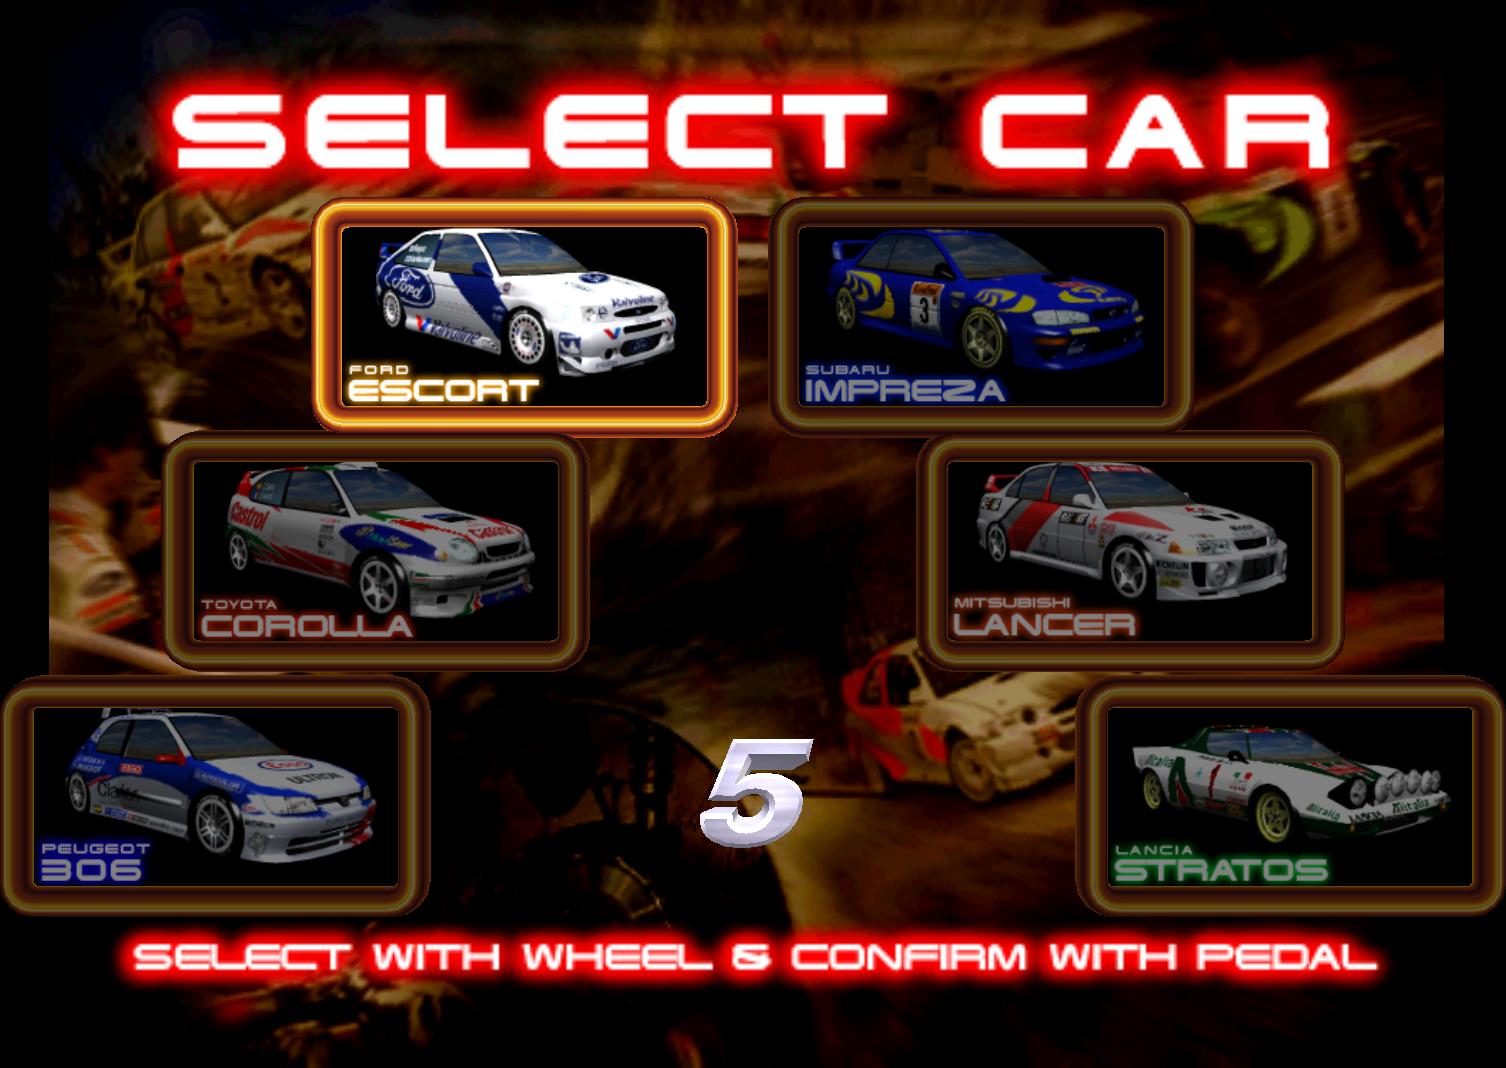 sega rally 2 championship details